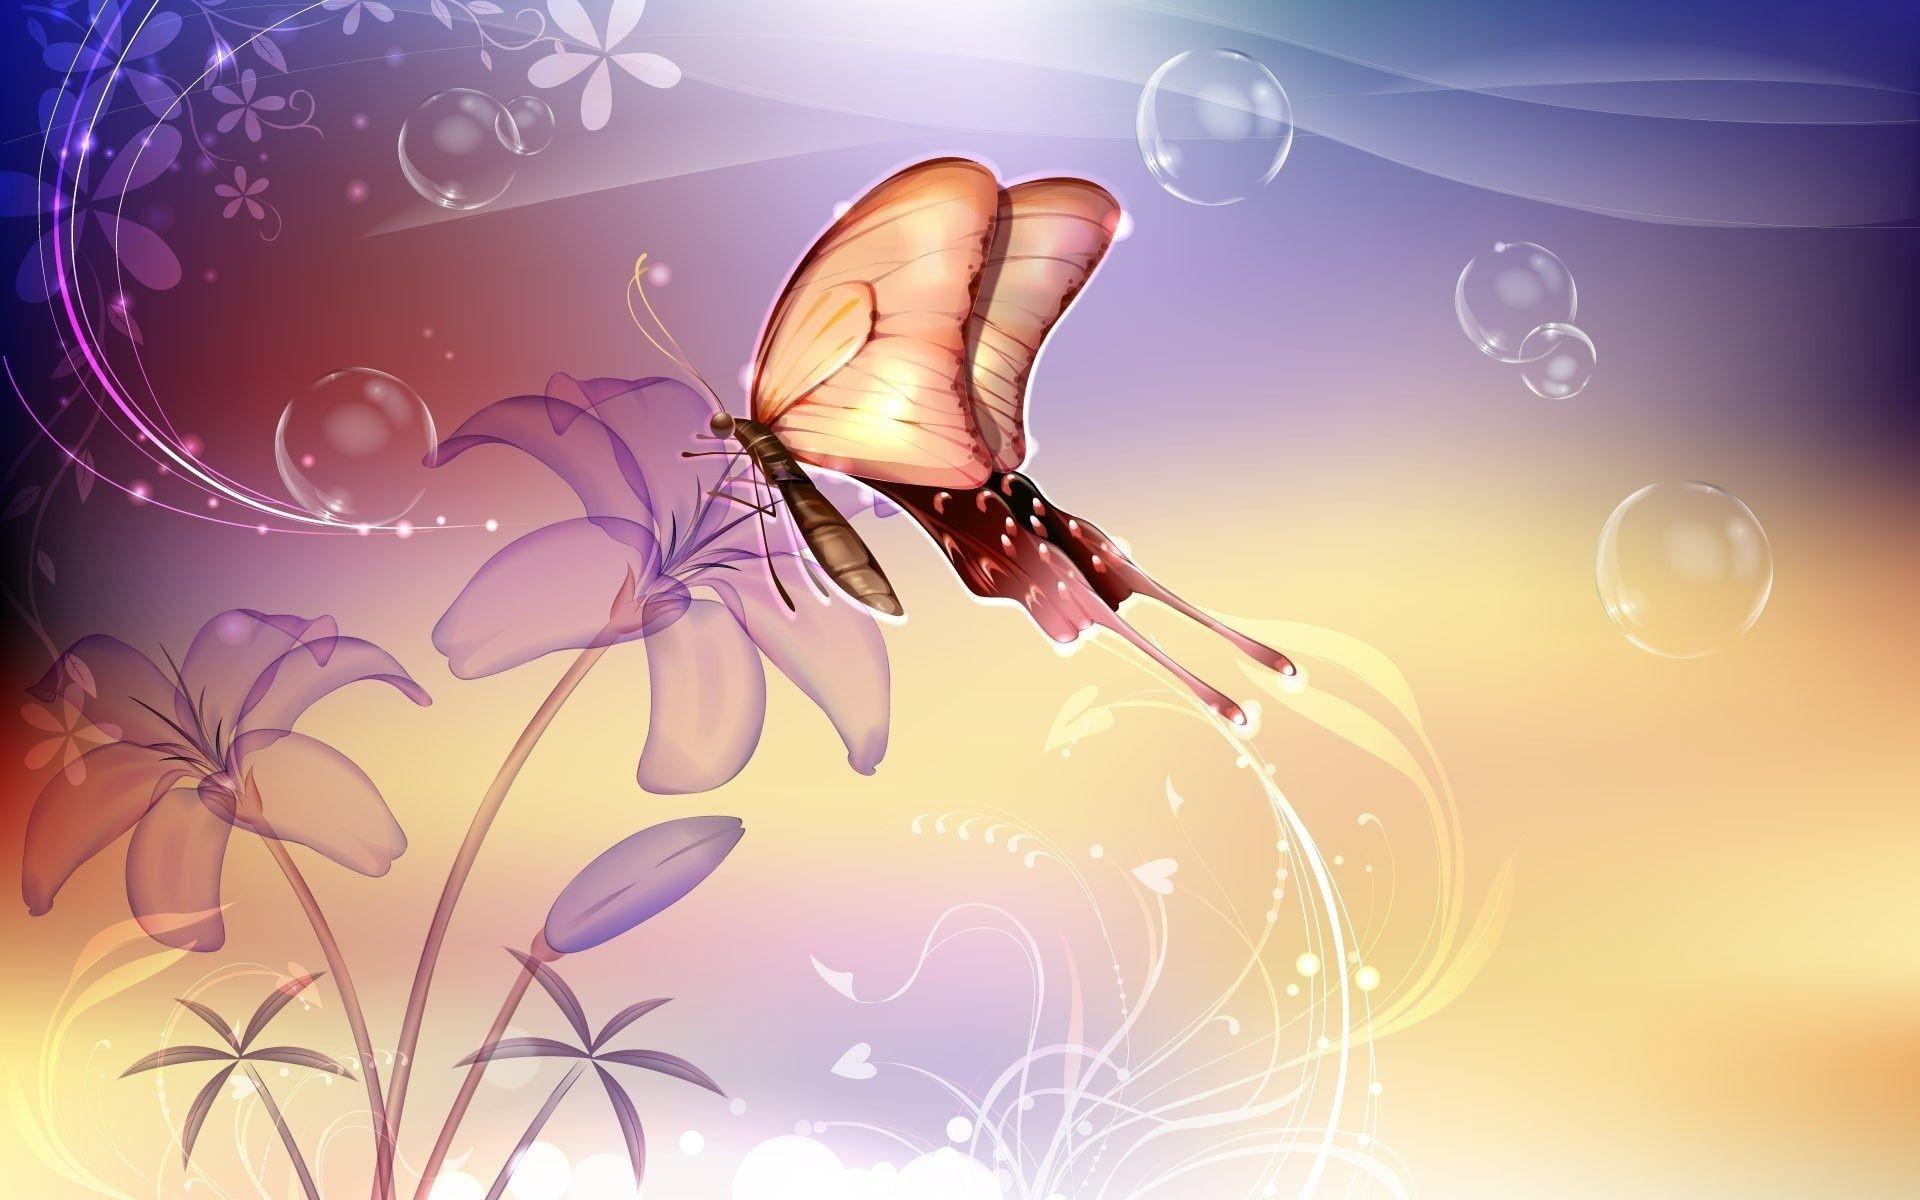 графика бабочки цветы вода graphics butterfly flowers water  № 1313492 бесплатно